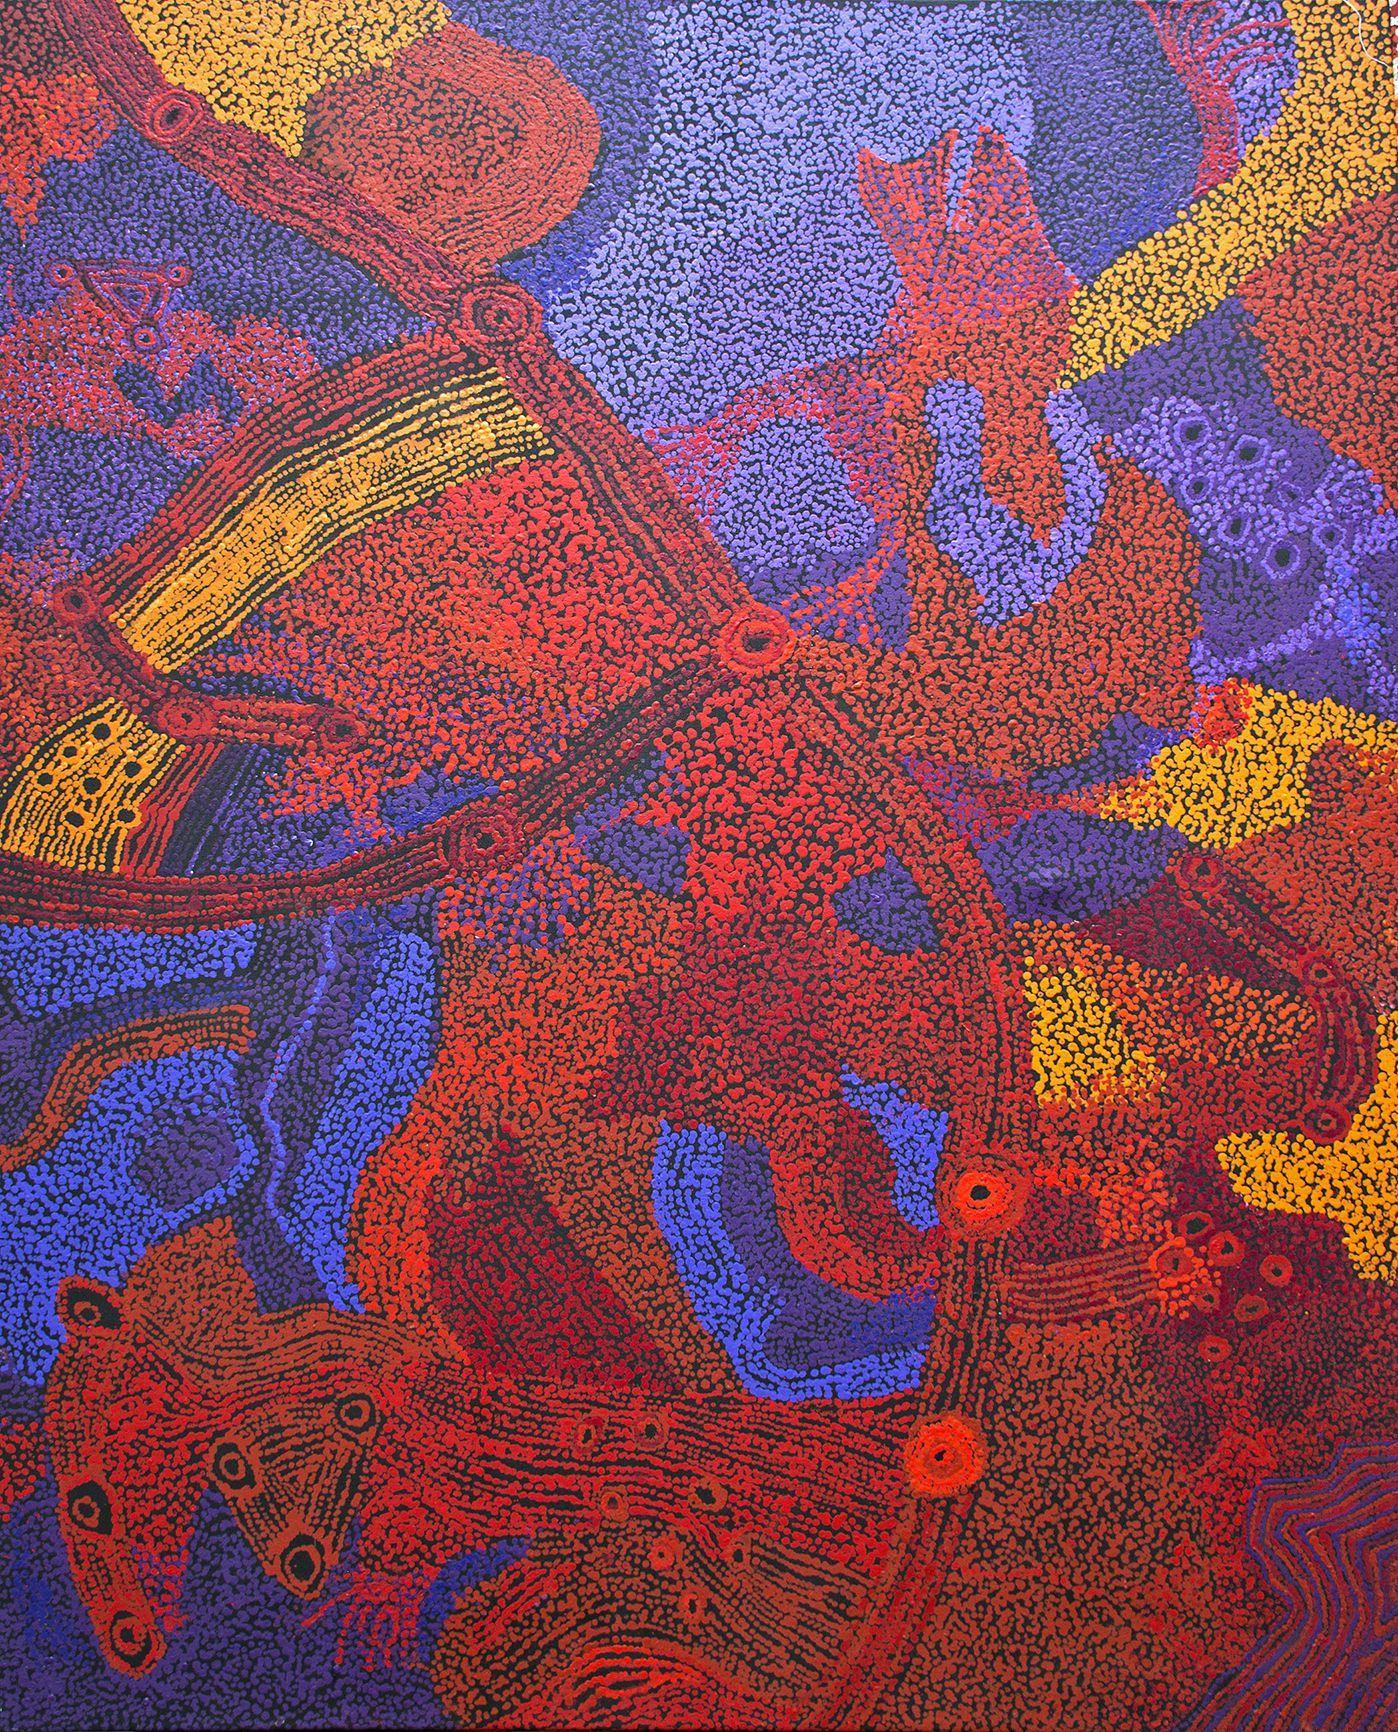 Sylvia Kanytjupai Ken - Seven Sister Dreaming Time stories - 152 x 122 cm http://www.aboriginalsignature.com/art-aborigene-tjala/sylvia-kanytjupai-ken-seven-sister-dreaming-time-stories-152-x-122-cm